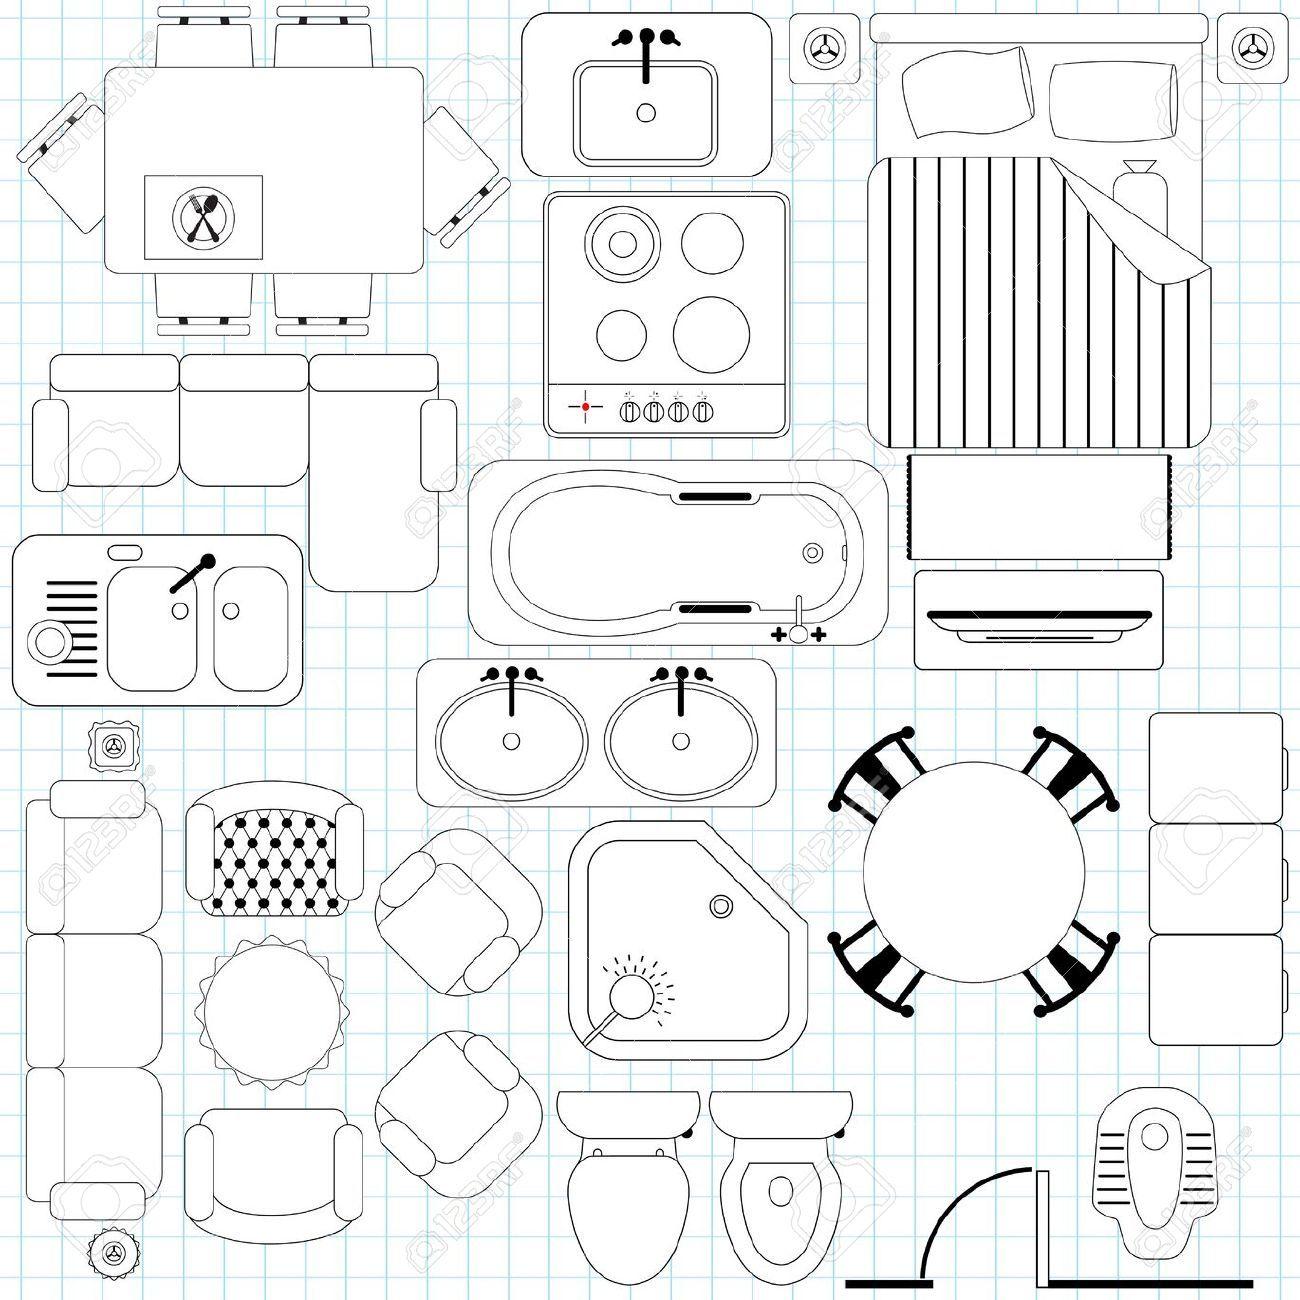 Clipart floorplan graphic black and white download Floor plan clipart 5 » Clipart Portal graphic black and white download